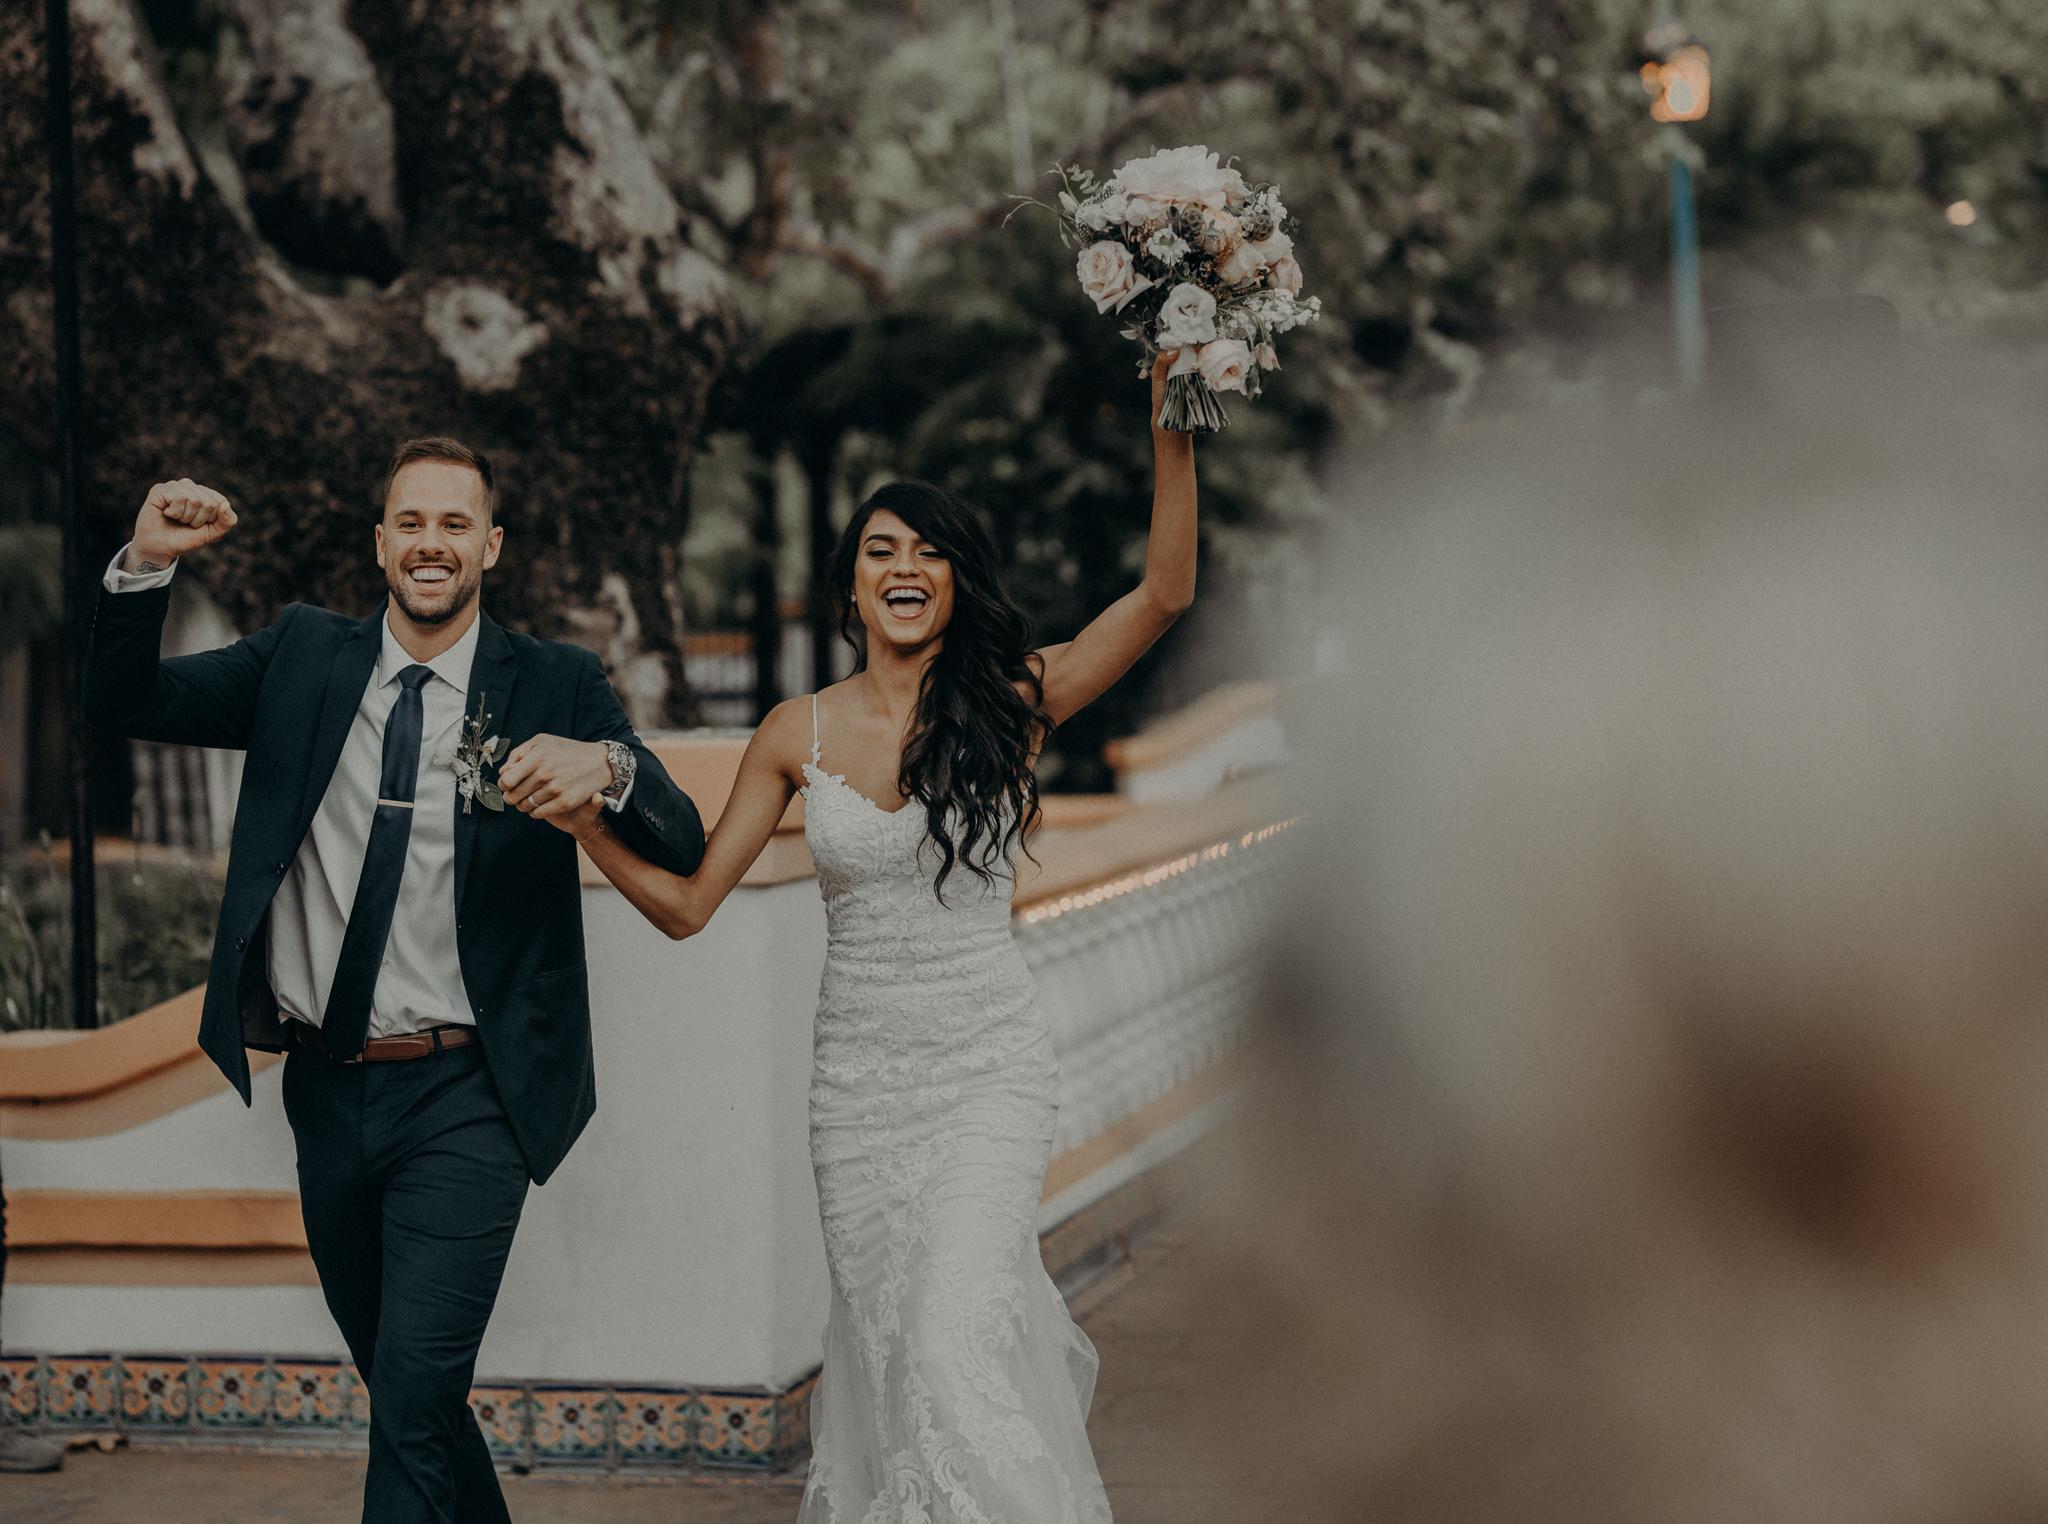 Isaiah + Taylor Photography - Rancho Las Lomas Wedding, Los Angeles Wedding Photographer-142.jpg